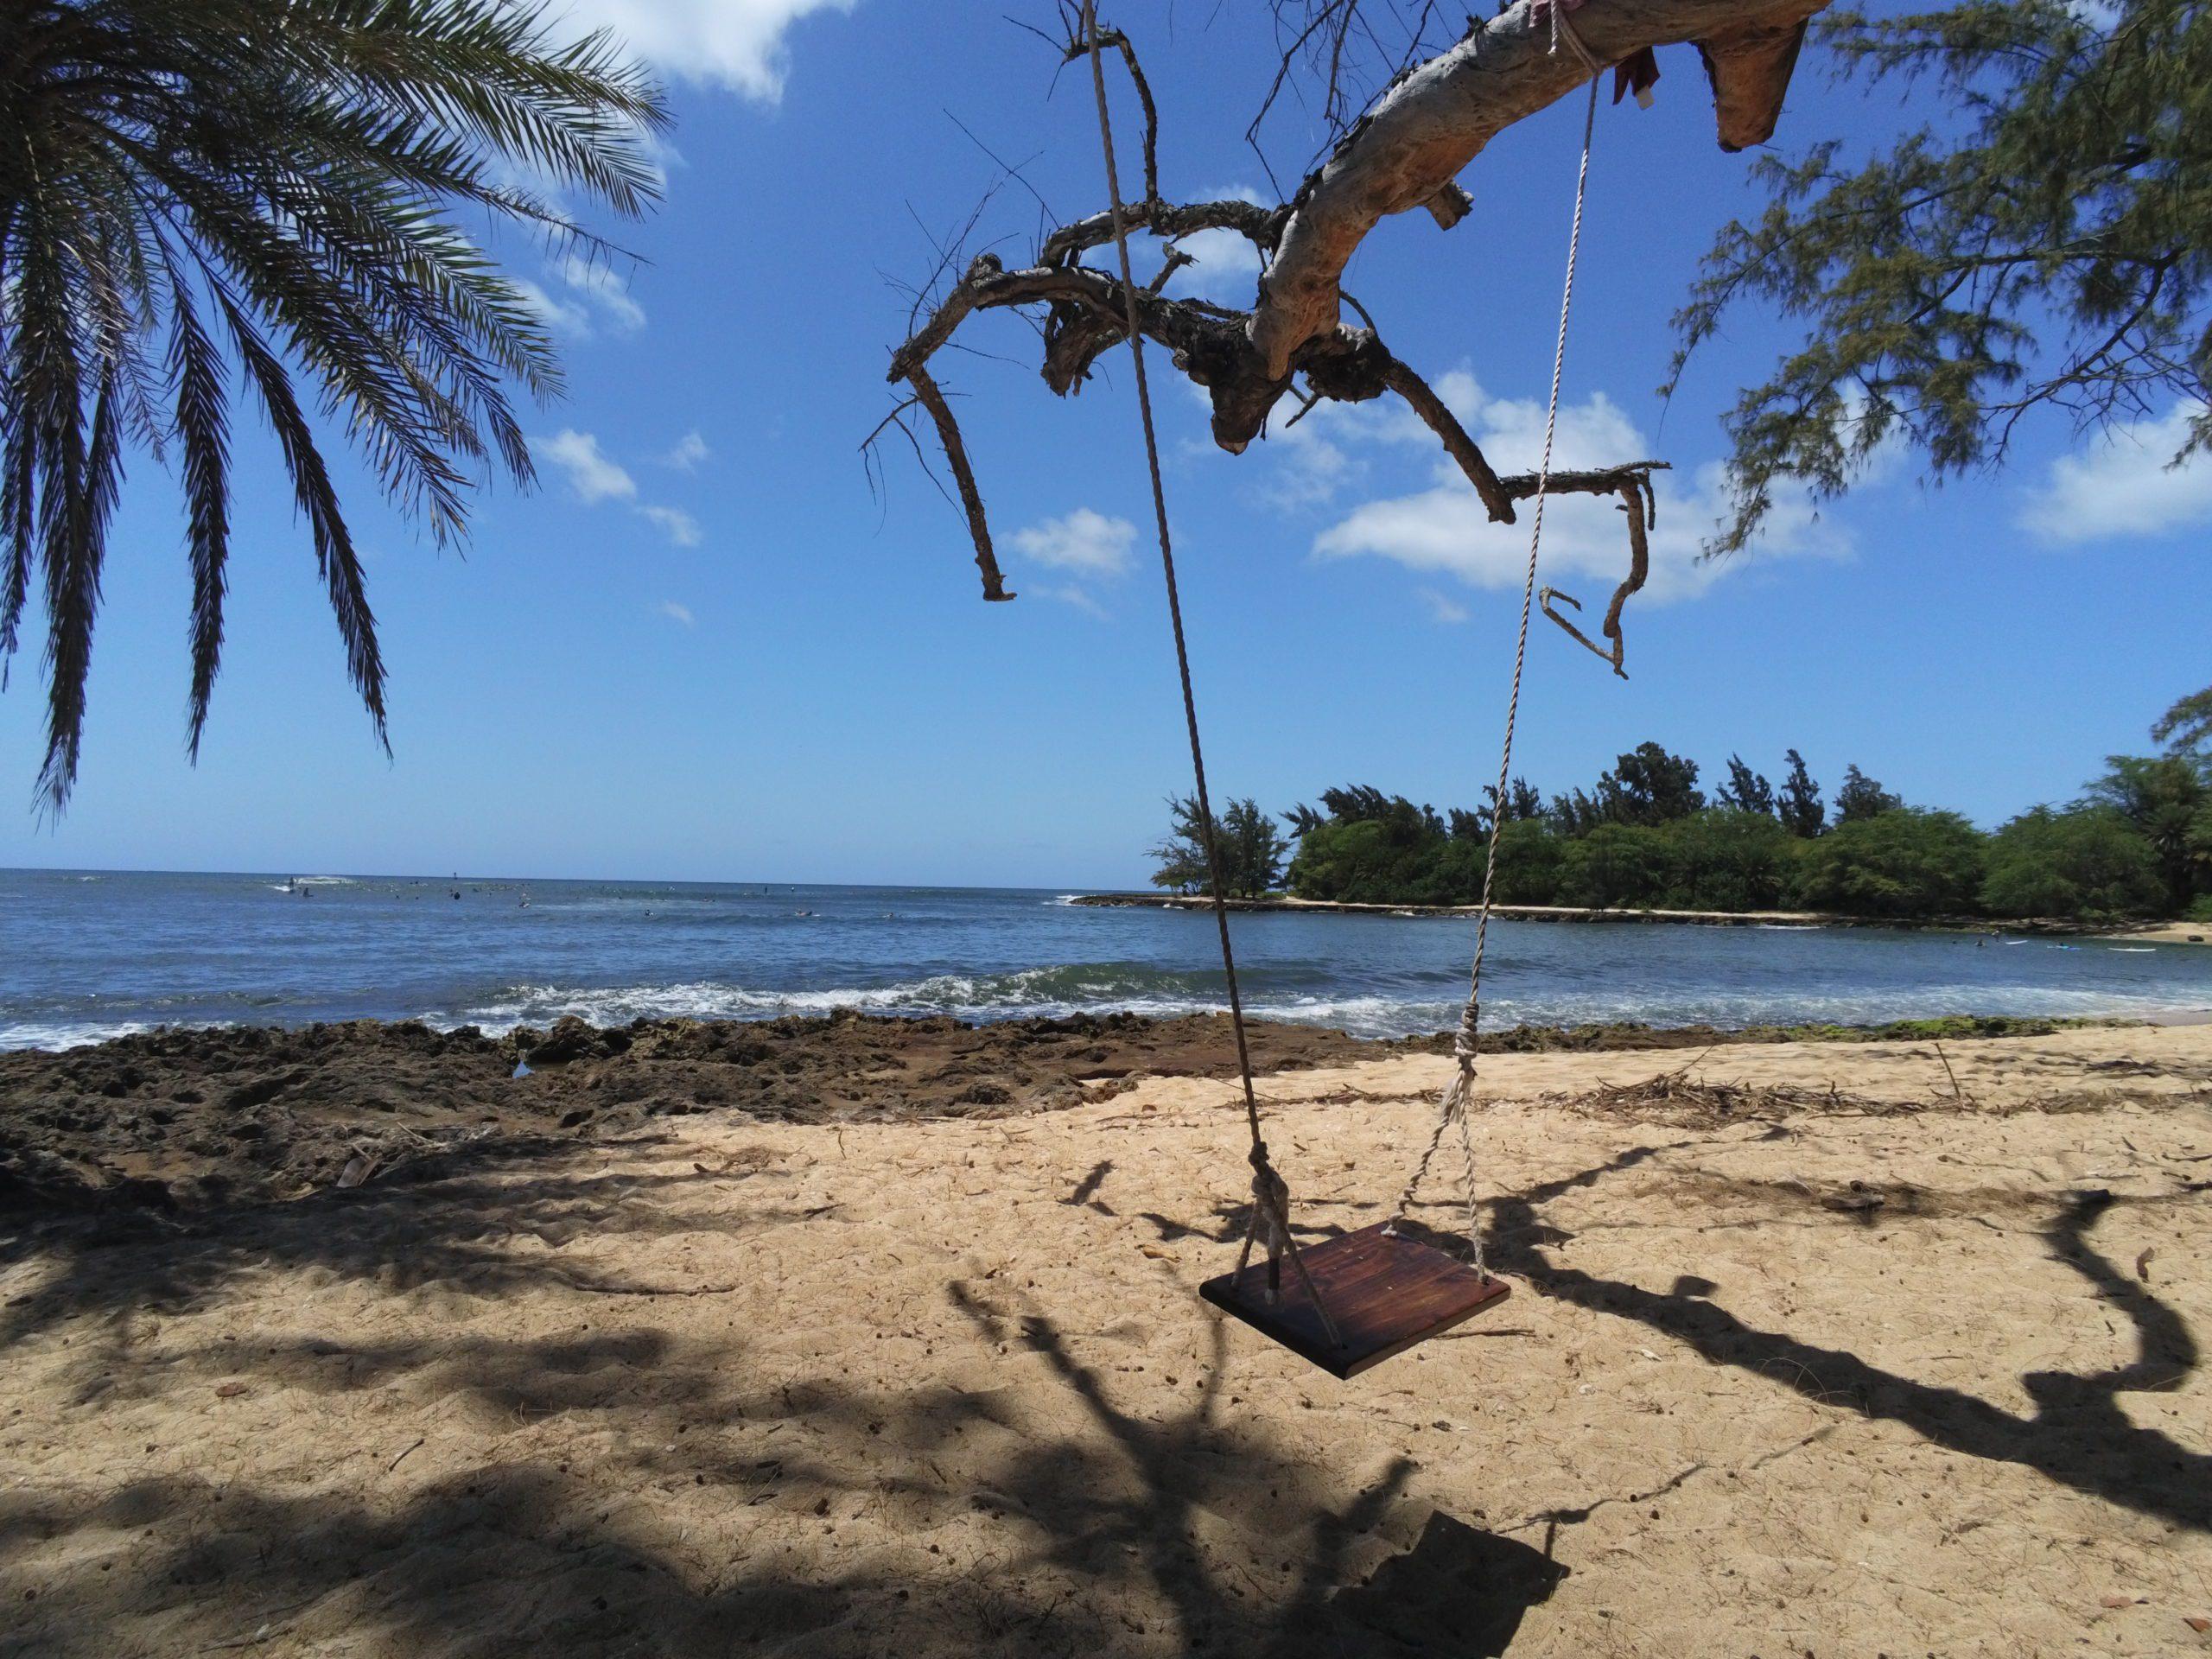 Schaukel mit Meerblick Strand North Shore Oahu Hawaii